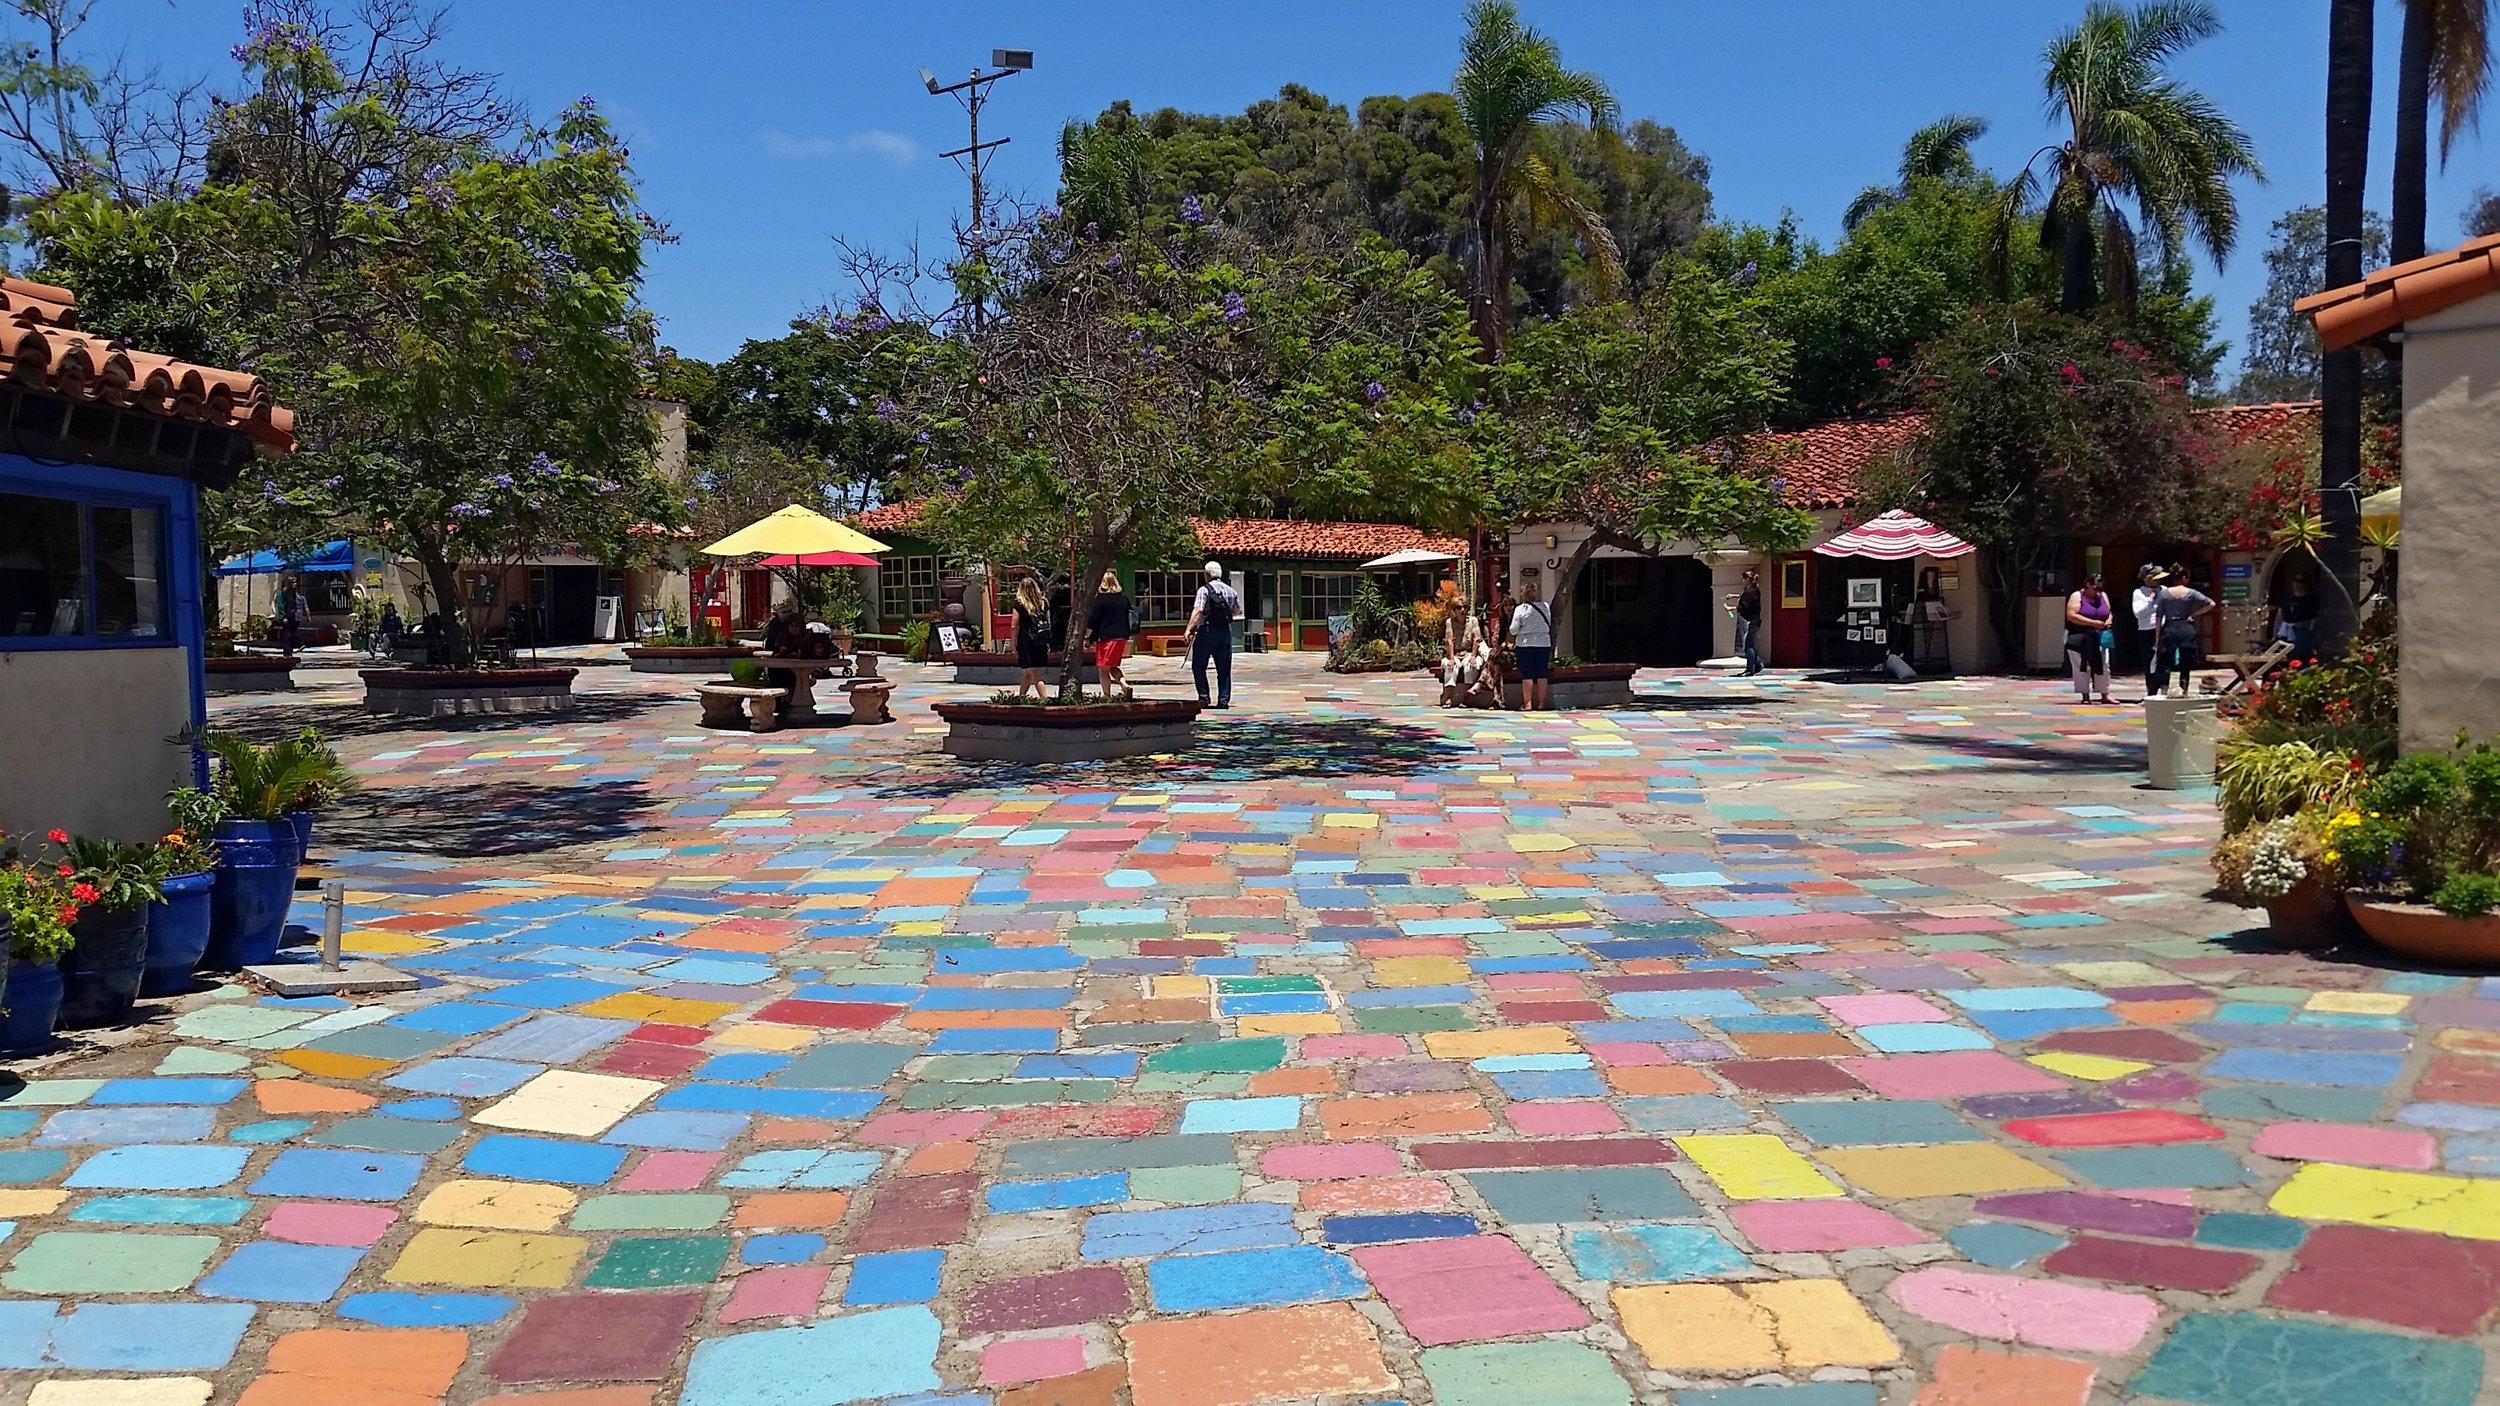 The Spanish Village in Balboa Park, San Diego.